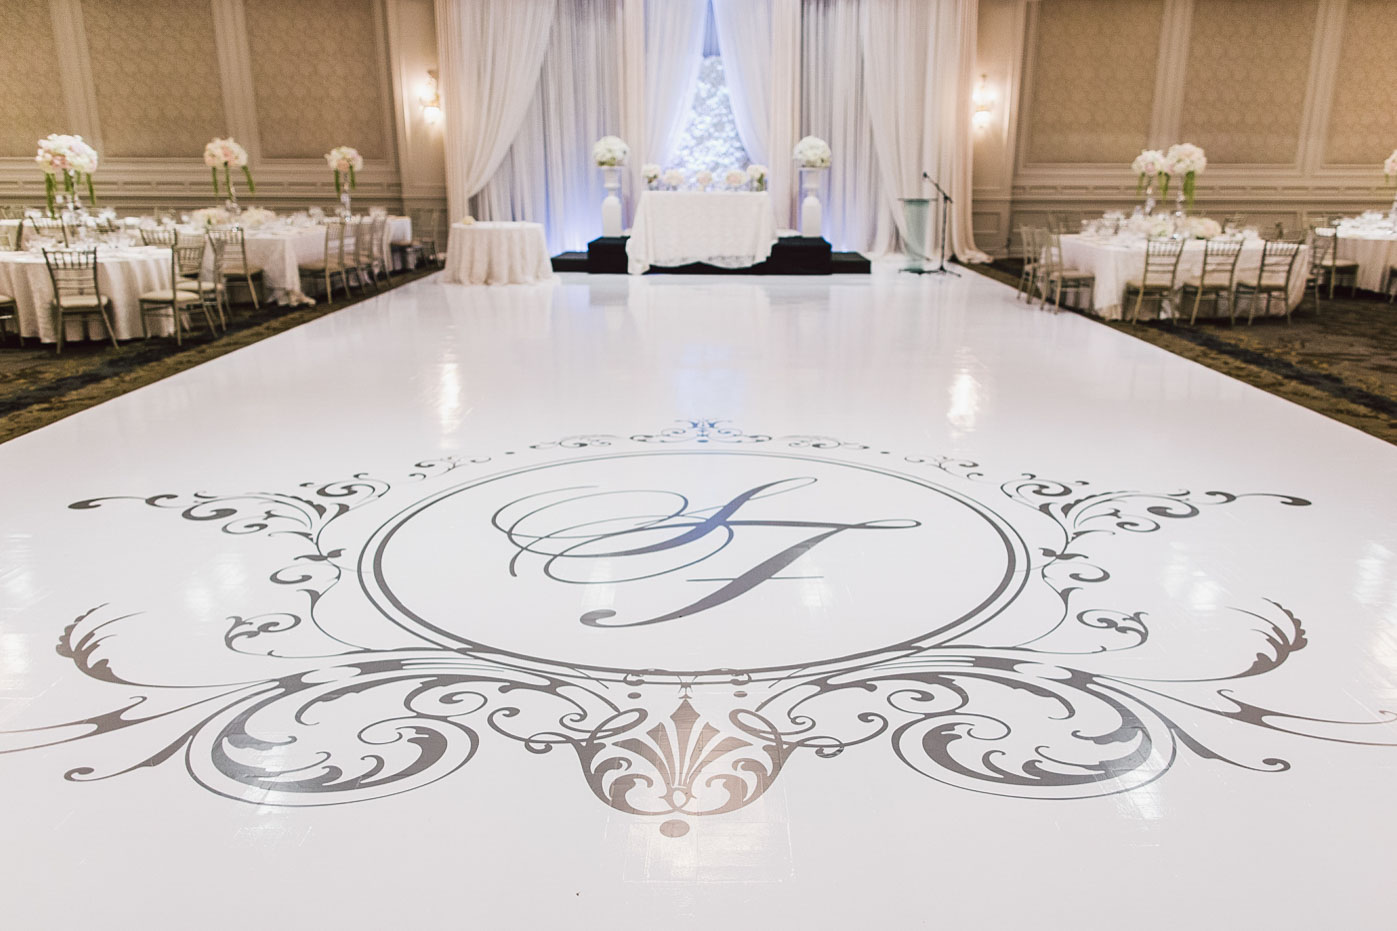 hazelton manor banquet hall